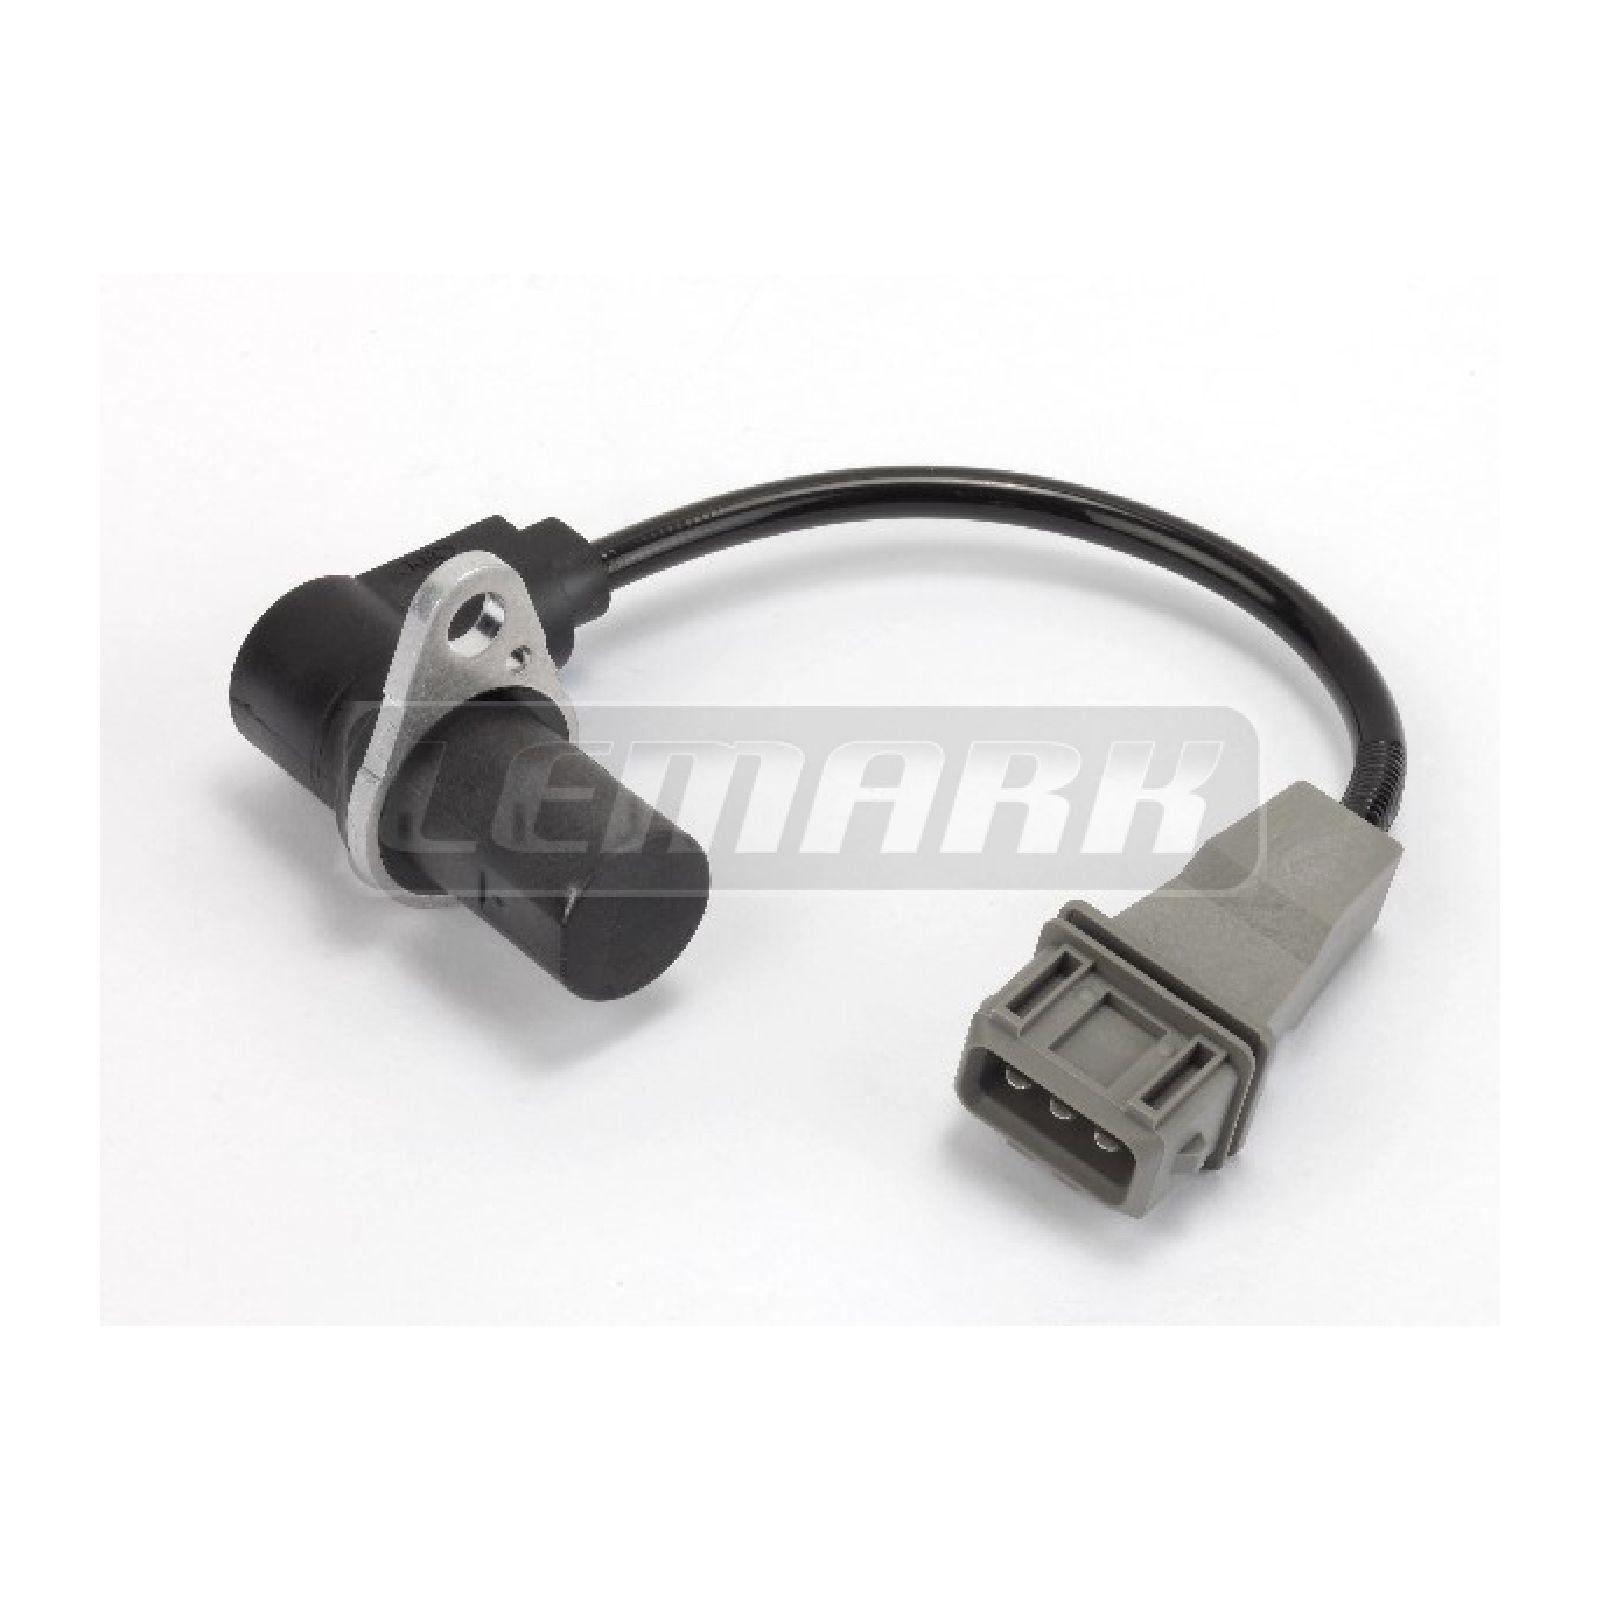 Fits Kia Sedona MK2 2.5 V6 Genuine Lemark Crankshaft Pulse